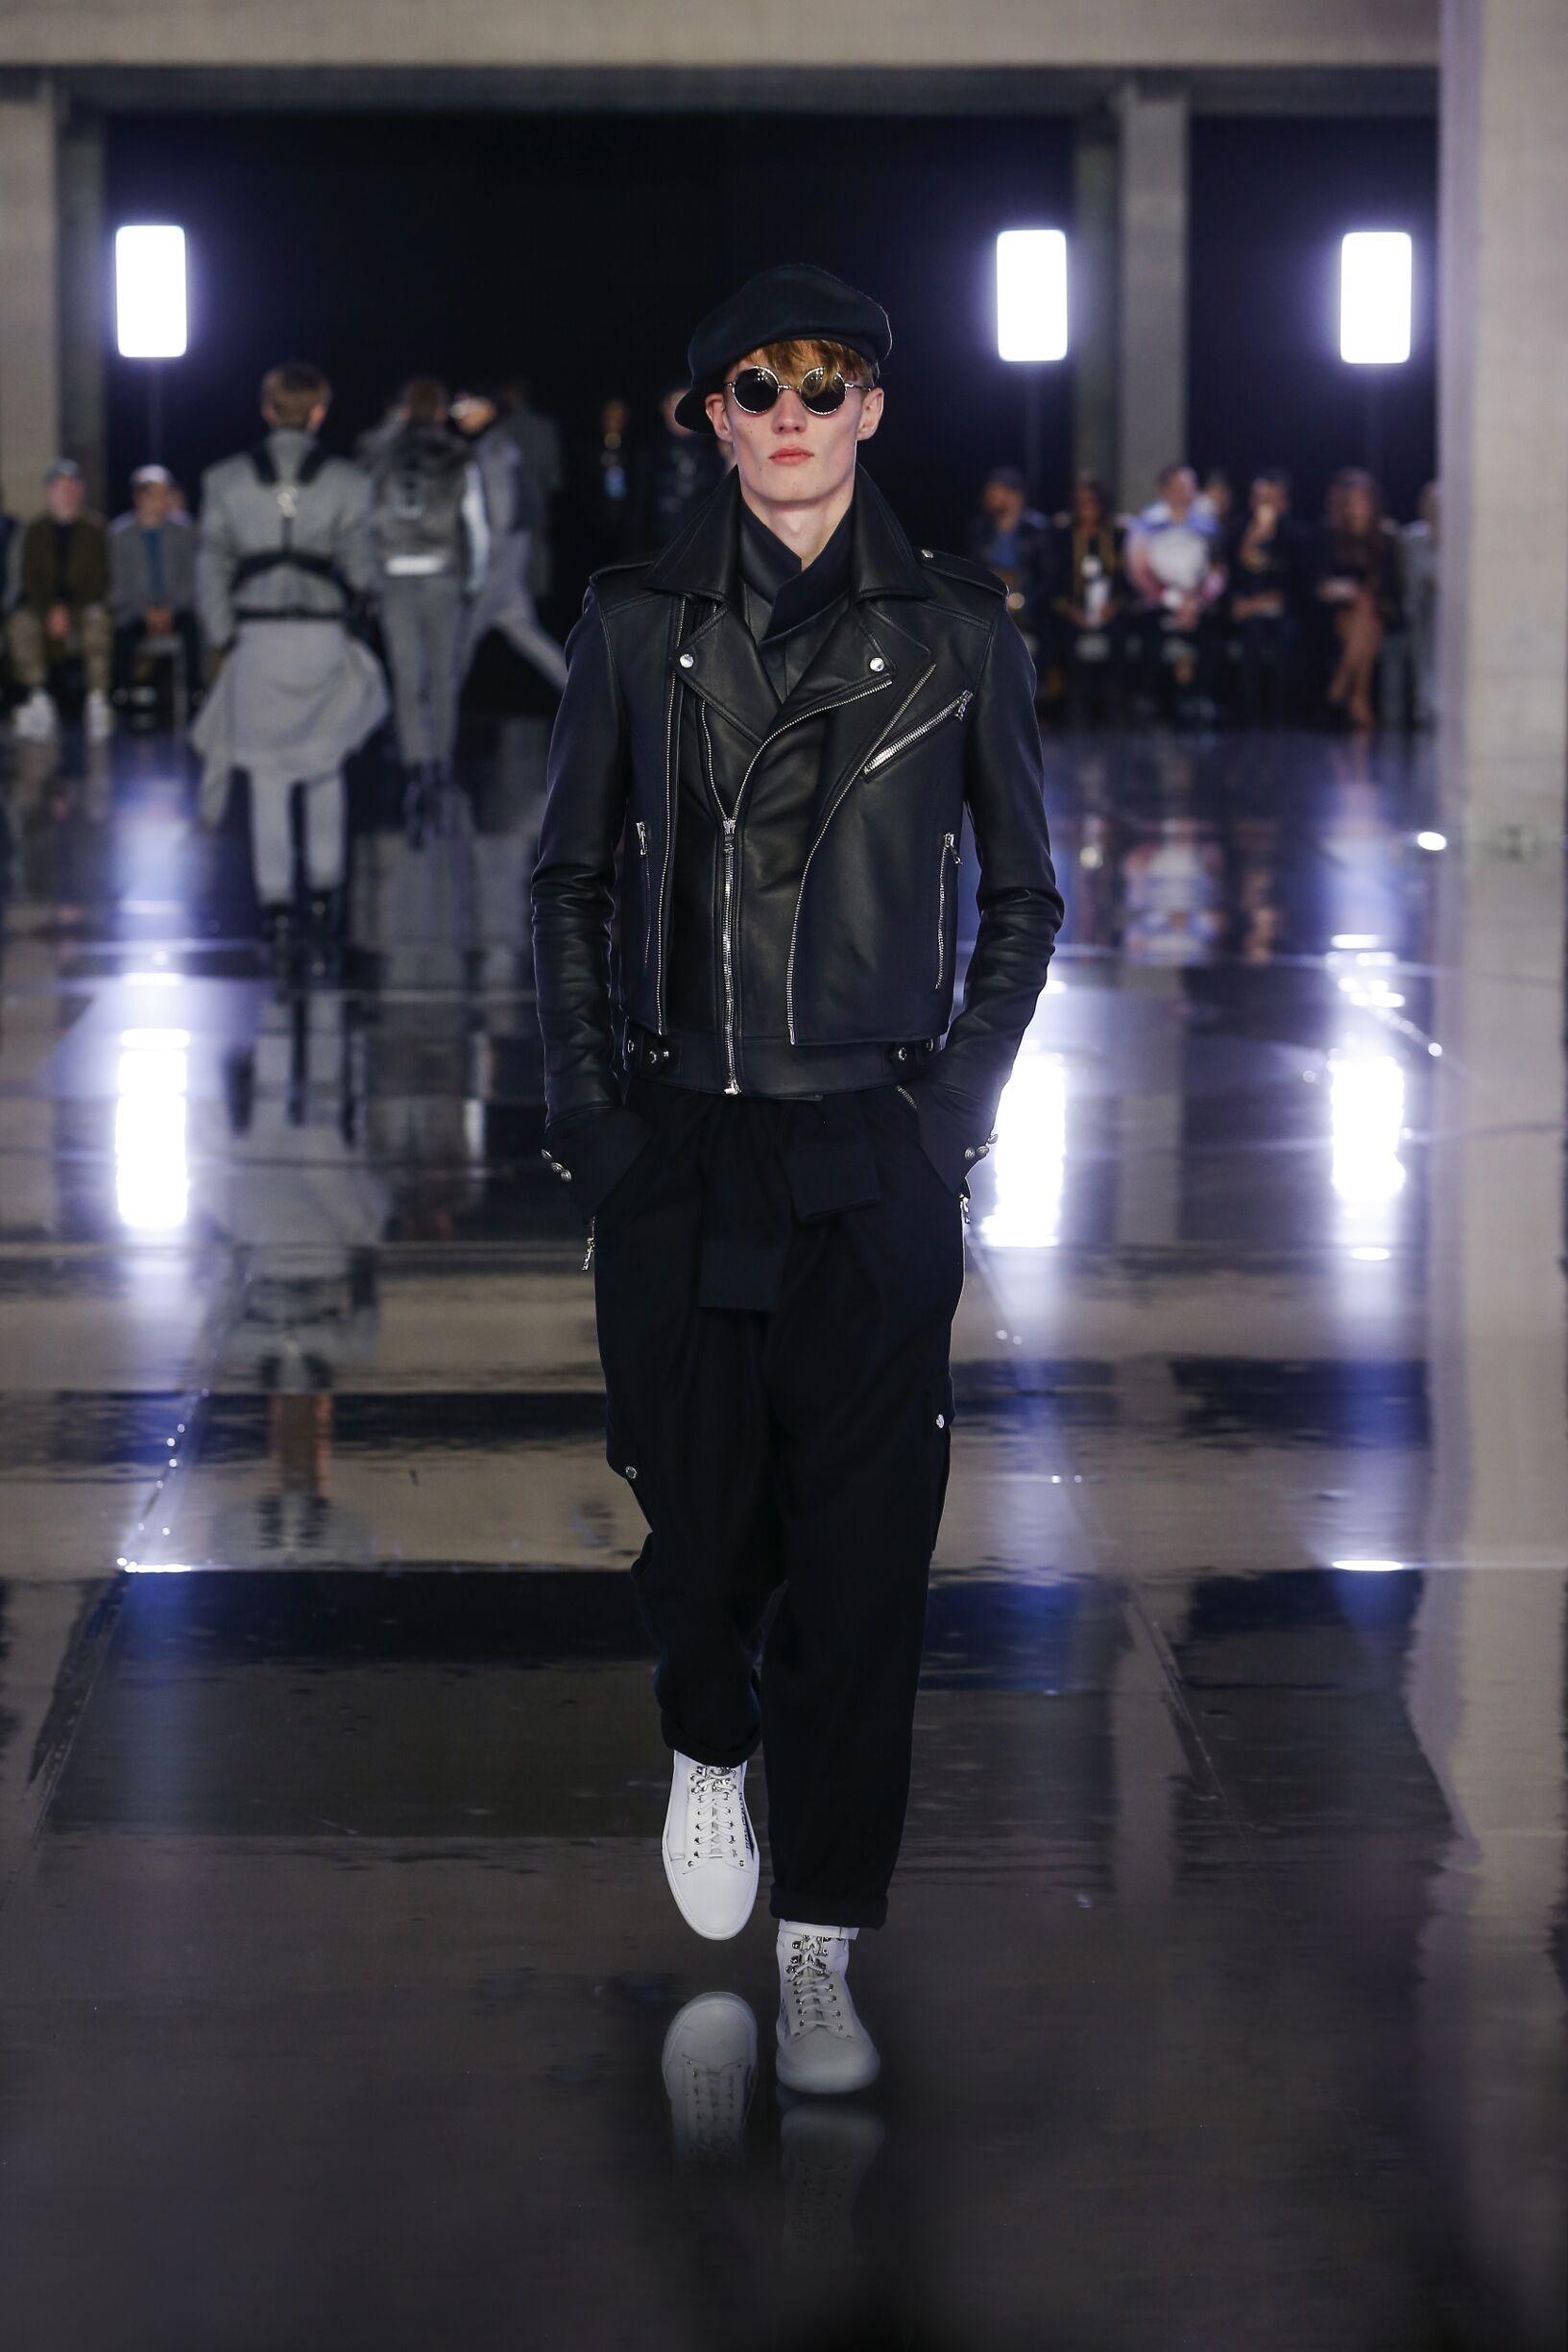 Model Fashion Week 2019 Catwalk Balmain